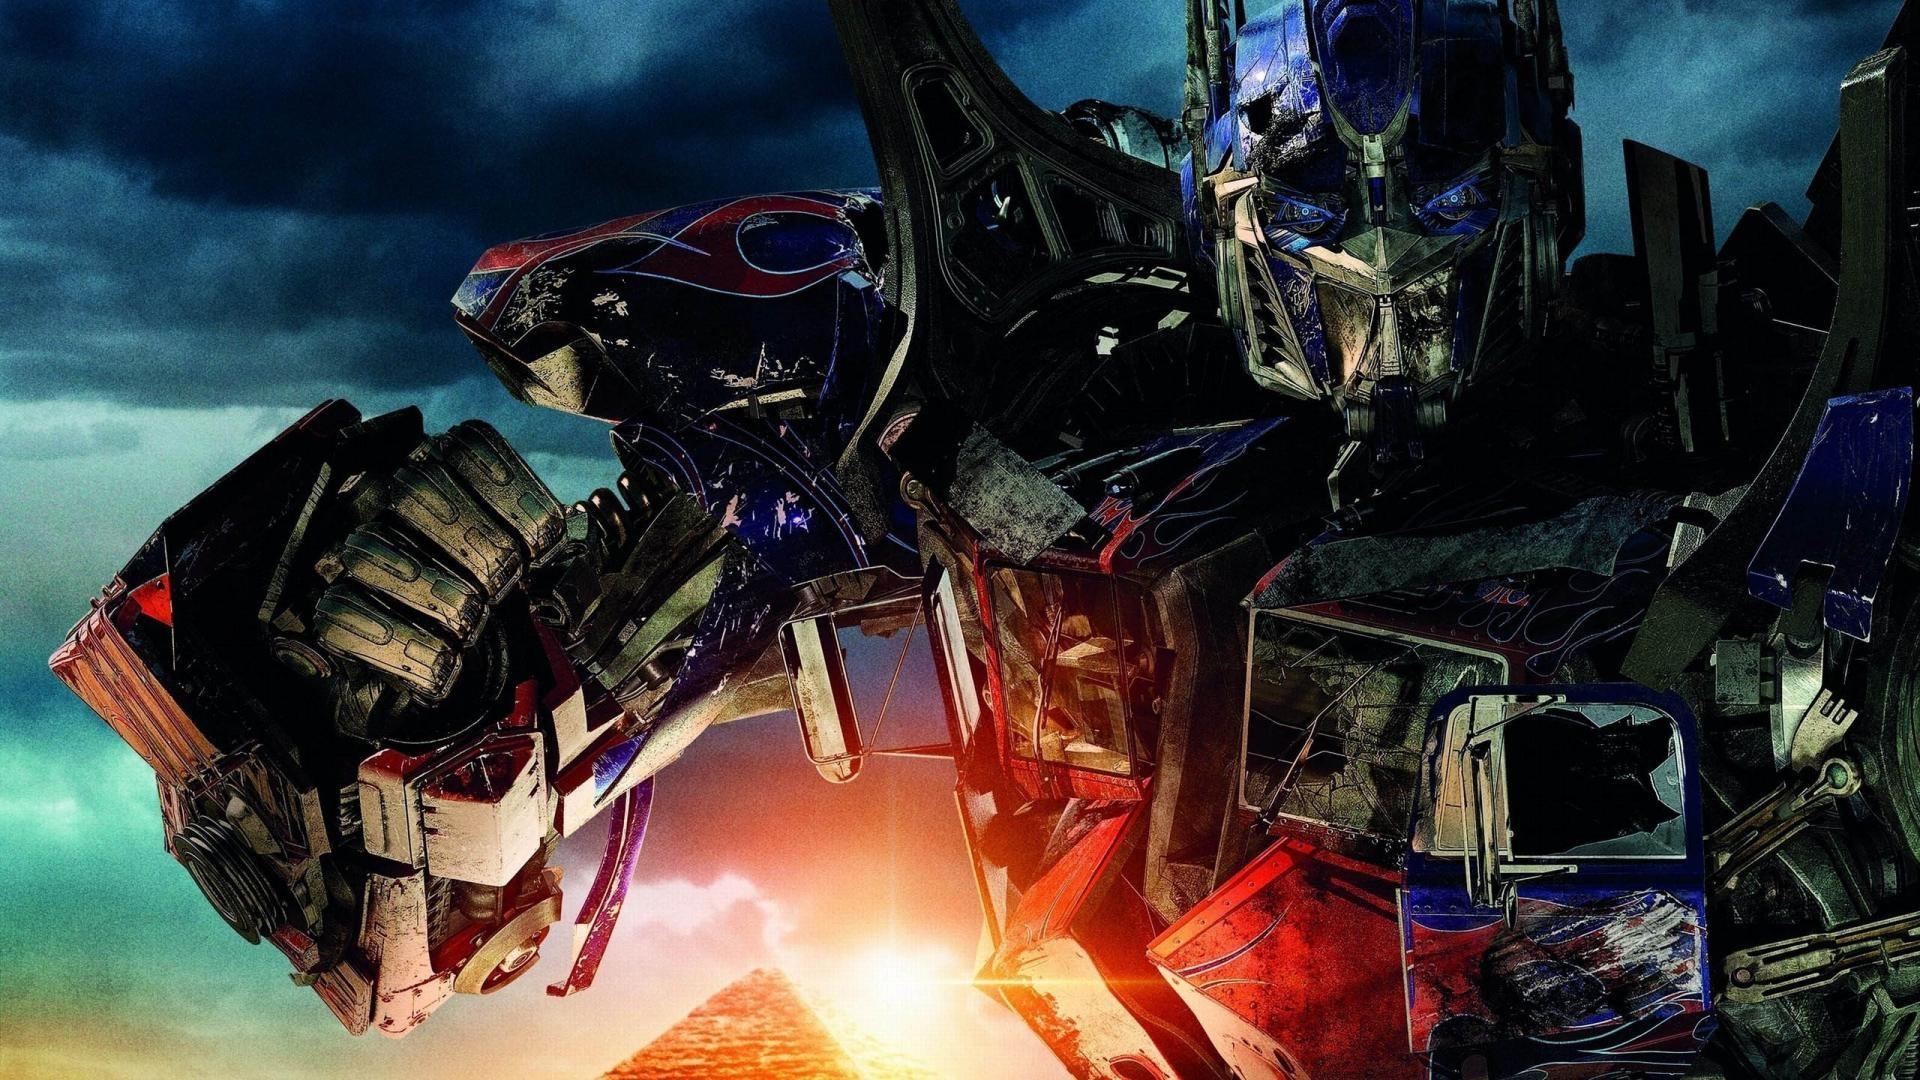 Transformers: Age of Extinction (2014) - IMDb